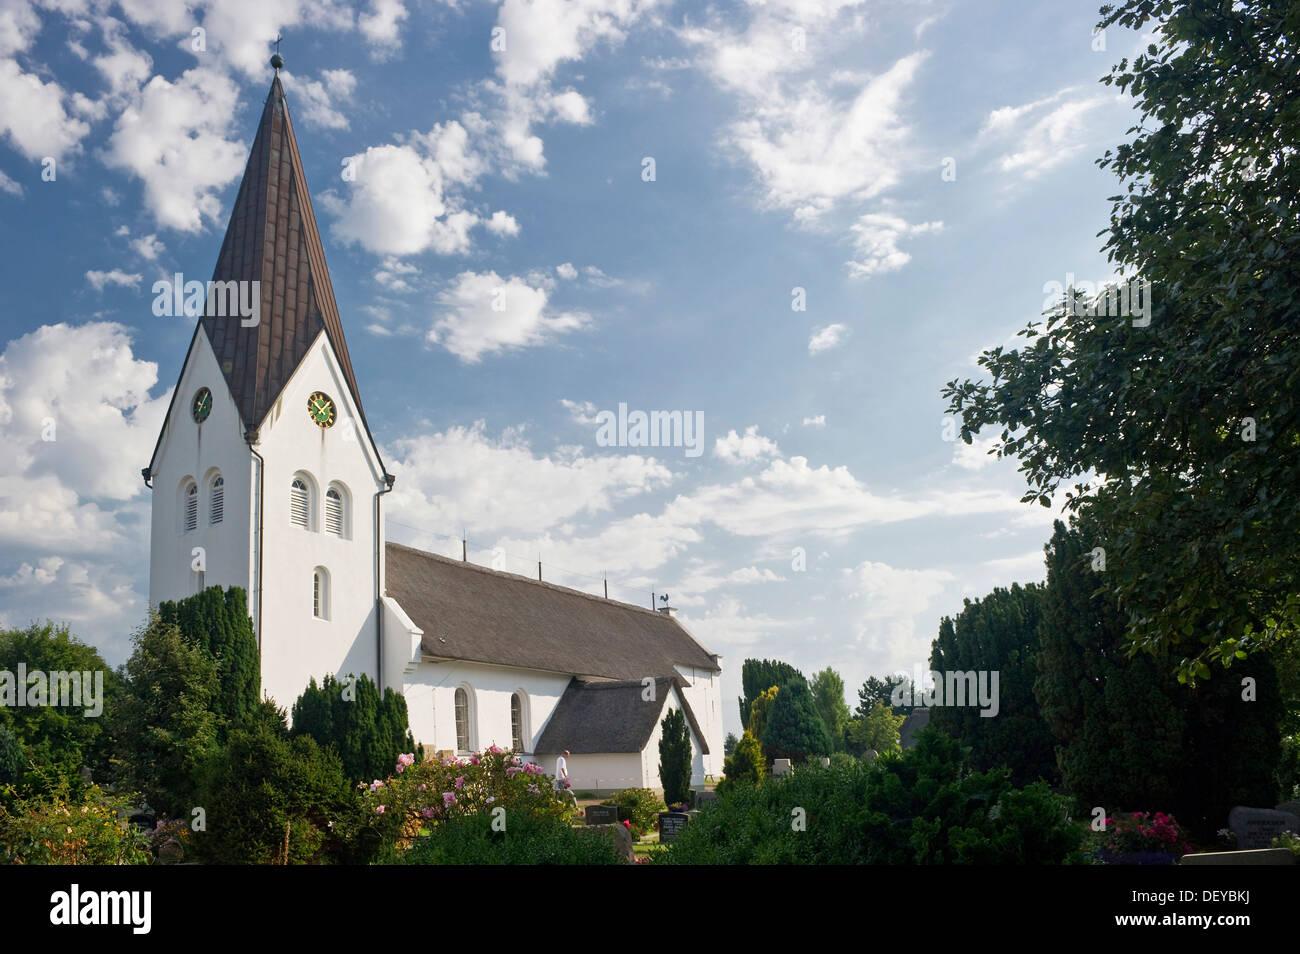 Church of St Clemens, Nebel, Amrum, North Frisian Islands, Schleswig-Holstein - Stock Image